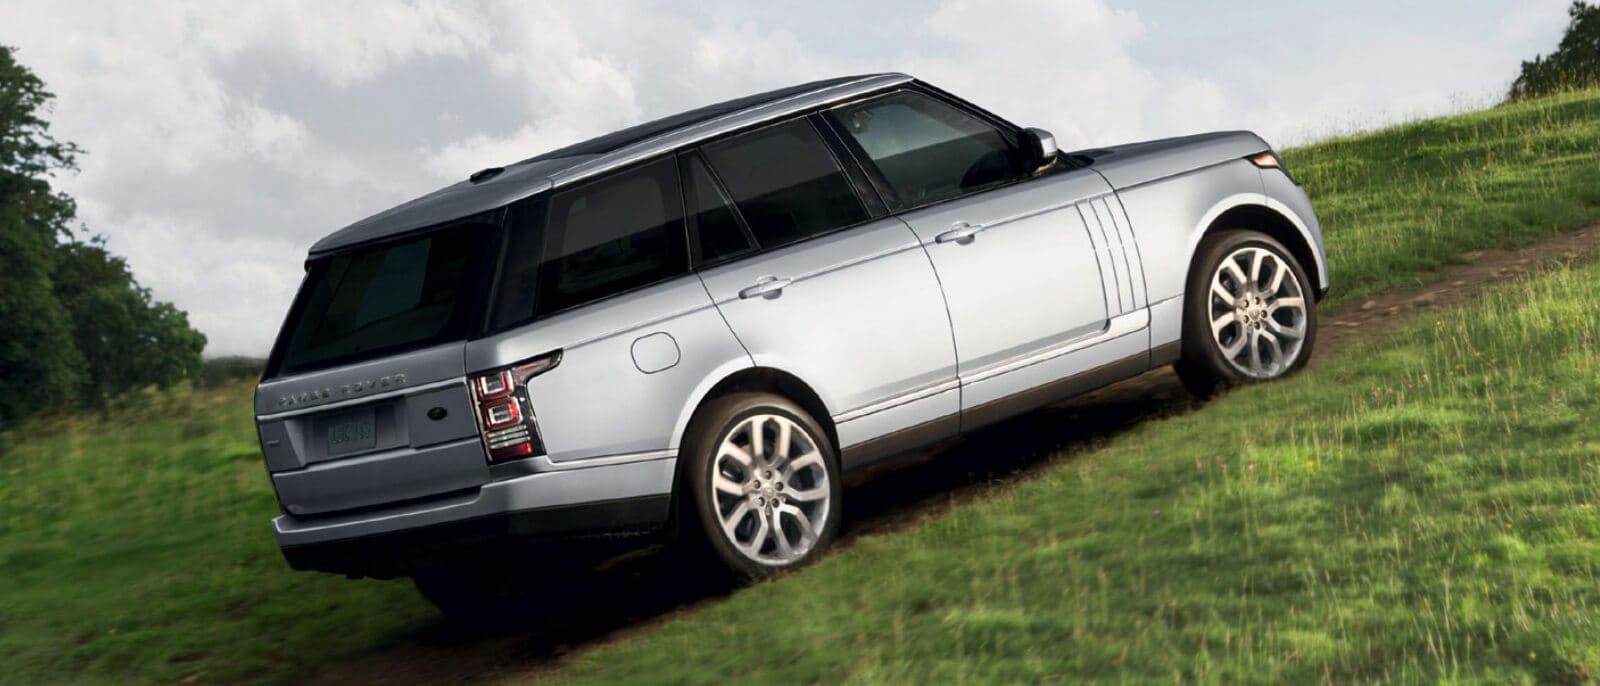 2016 Land Rover Range Rover SVAutobiography slide1